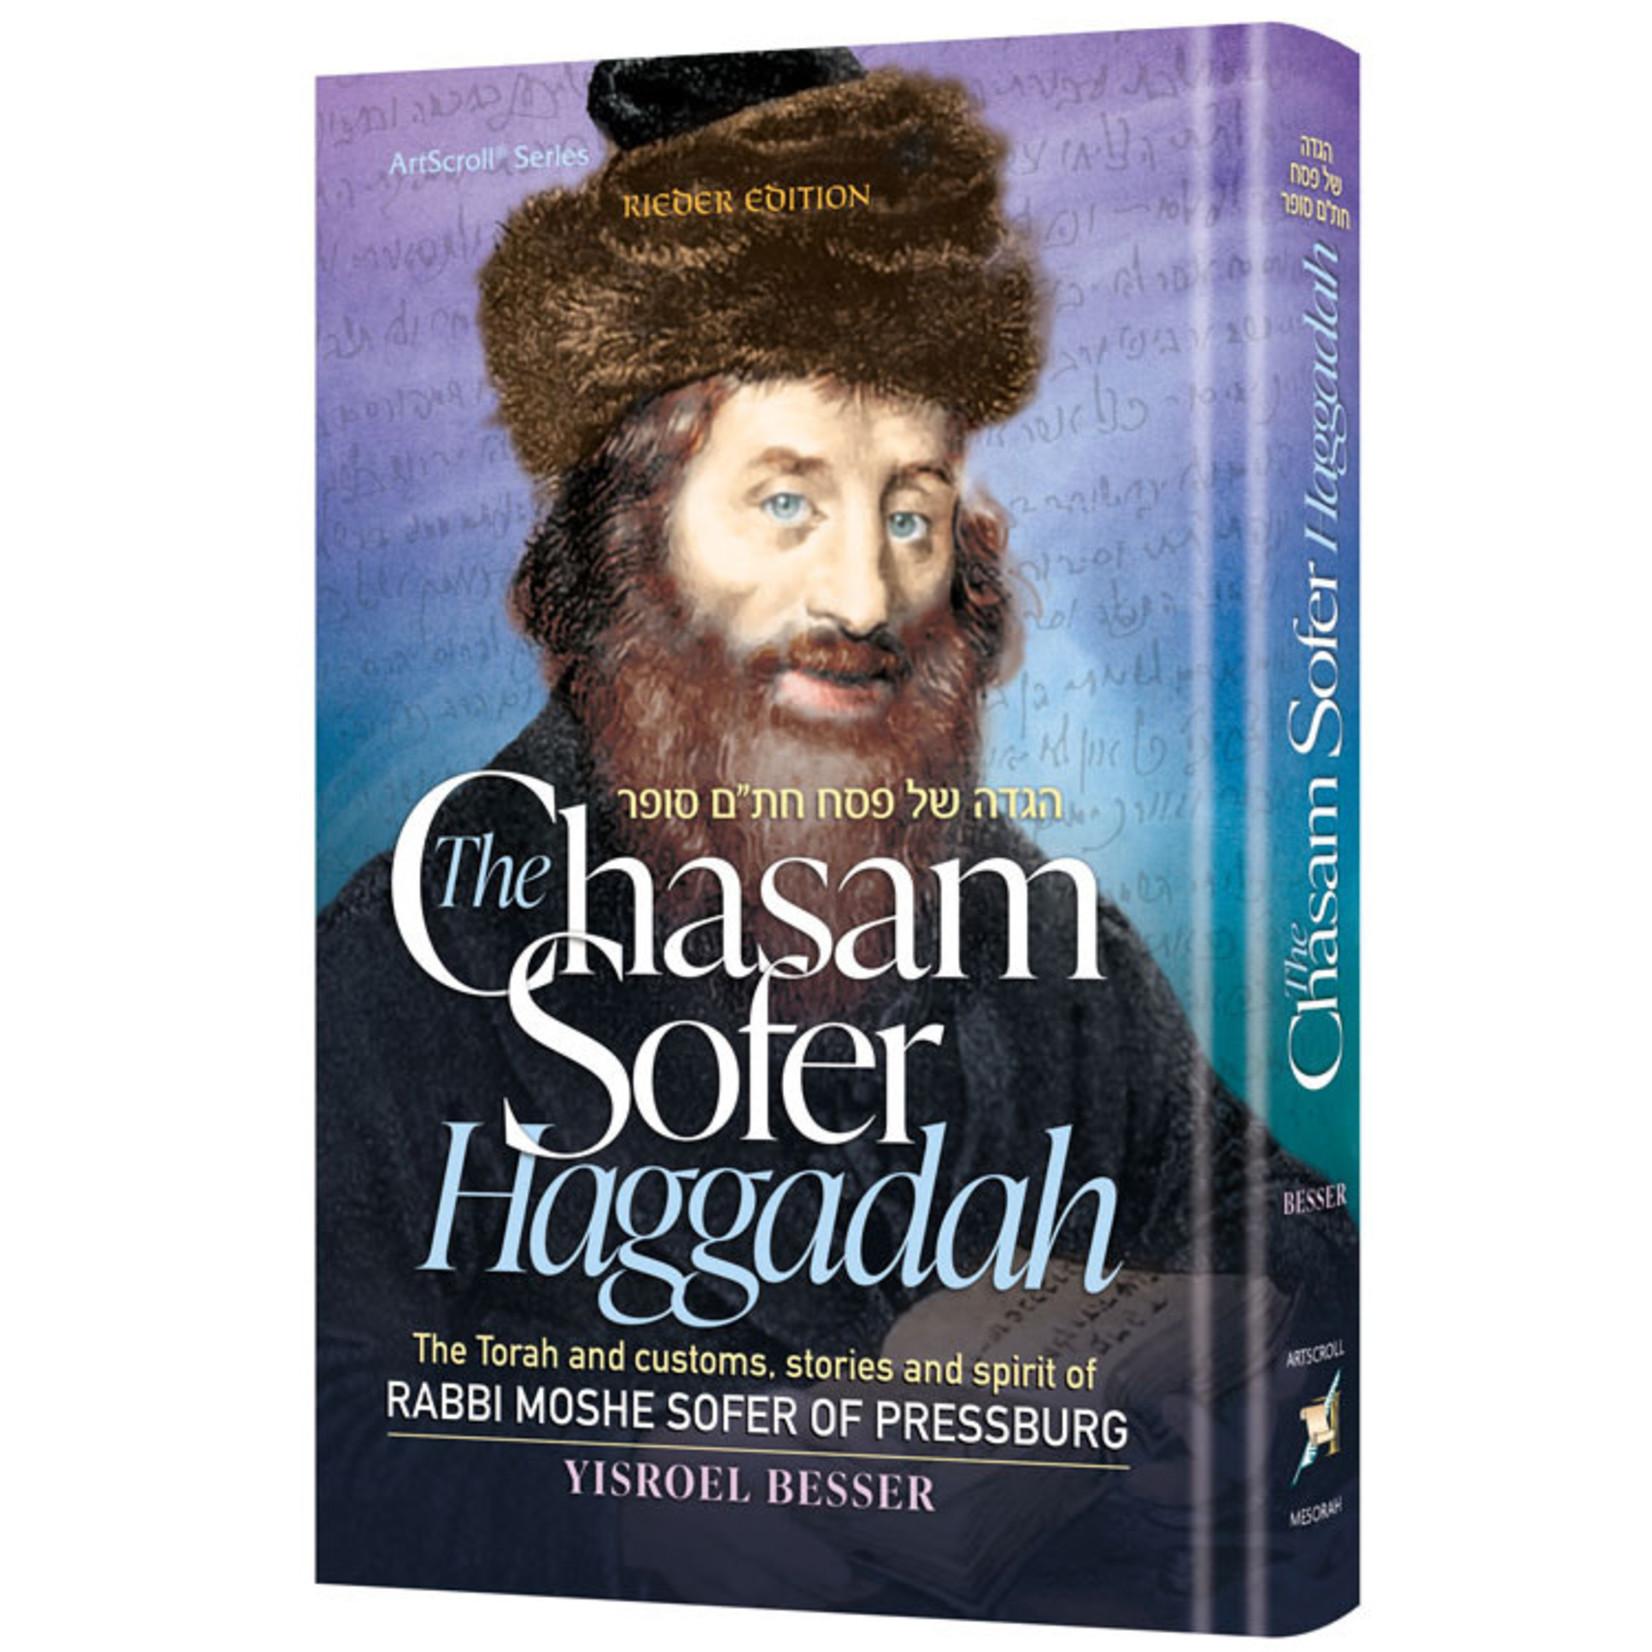 Chasam Sofer Haggadah